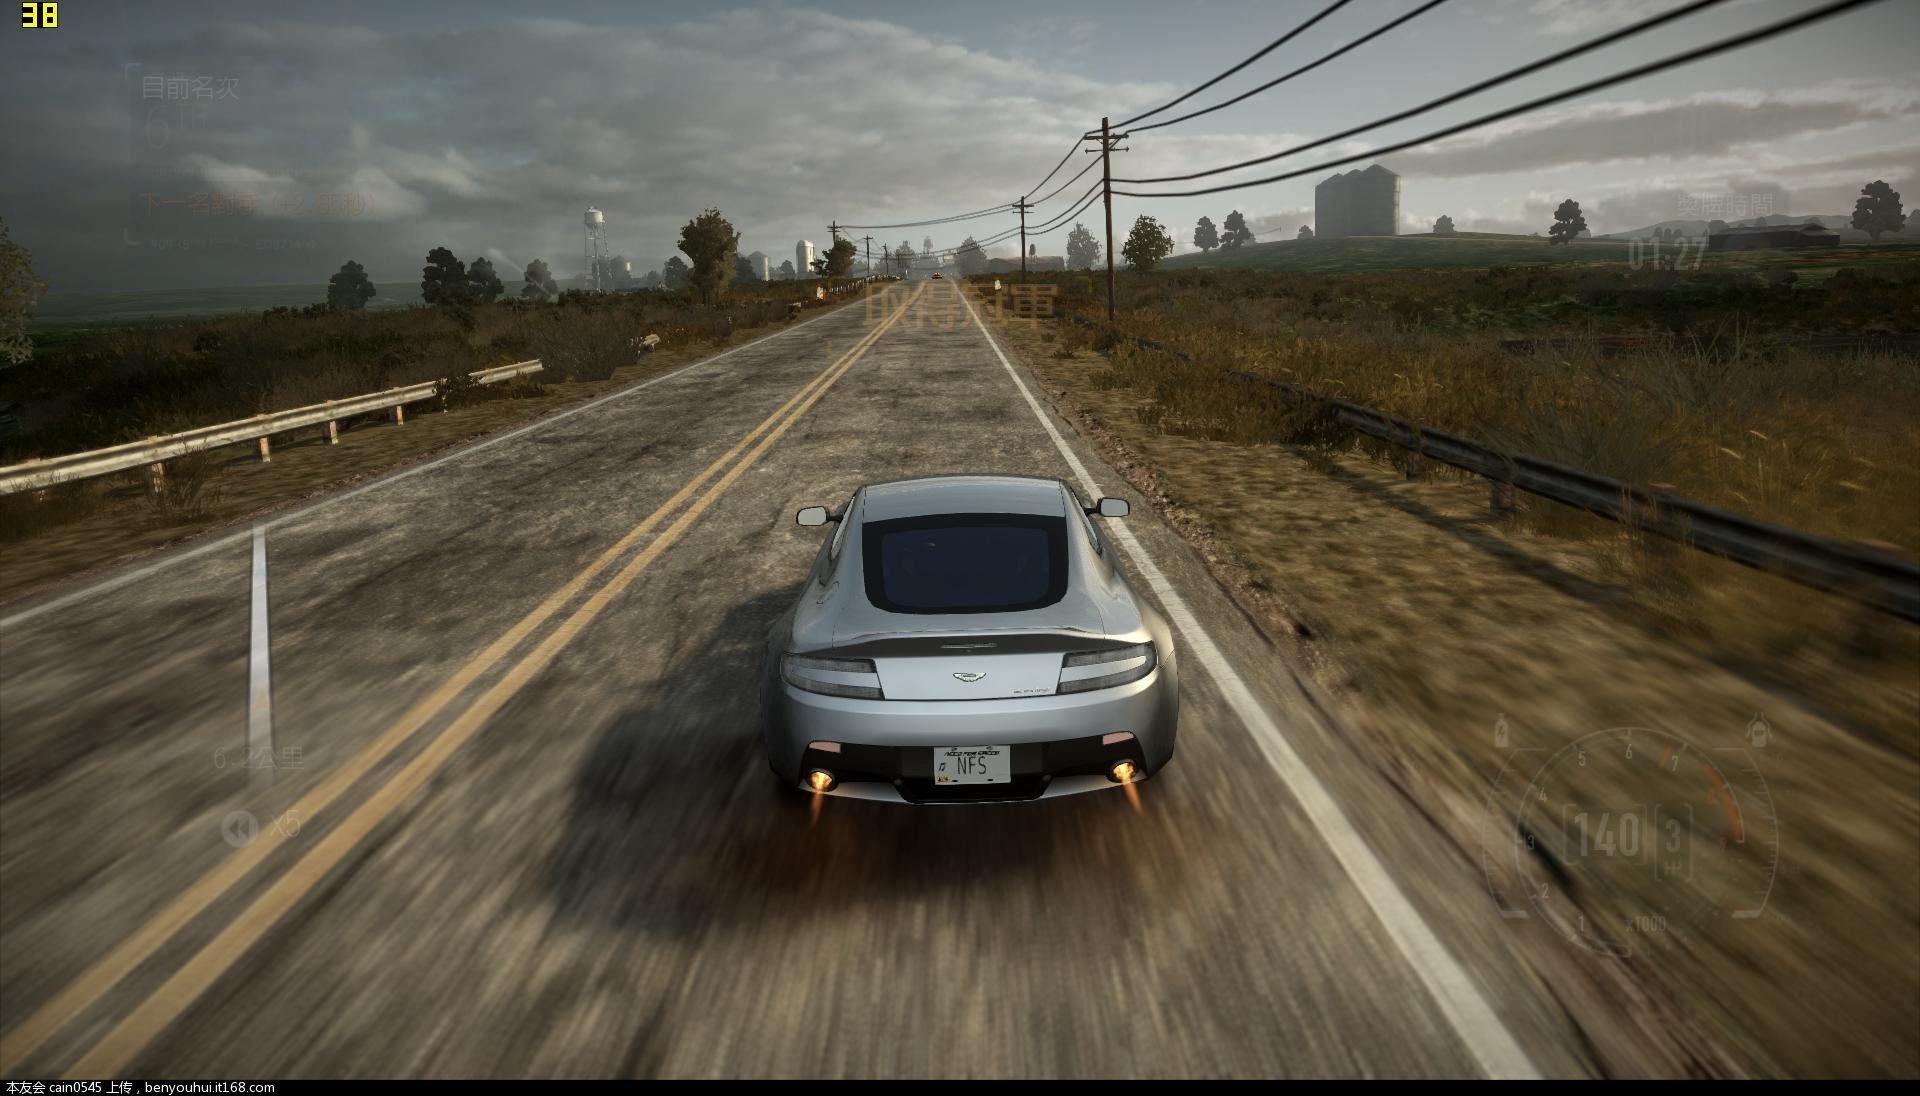 Need For Speed The Run 2012-10-10 01-19-47-54.jpg